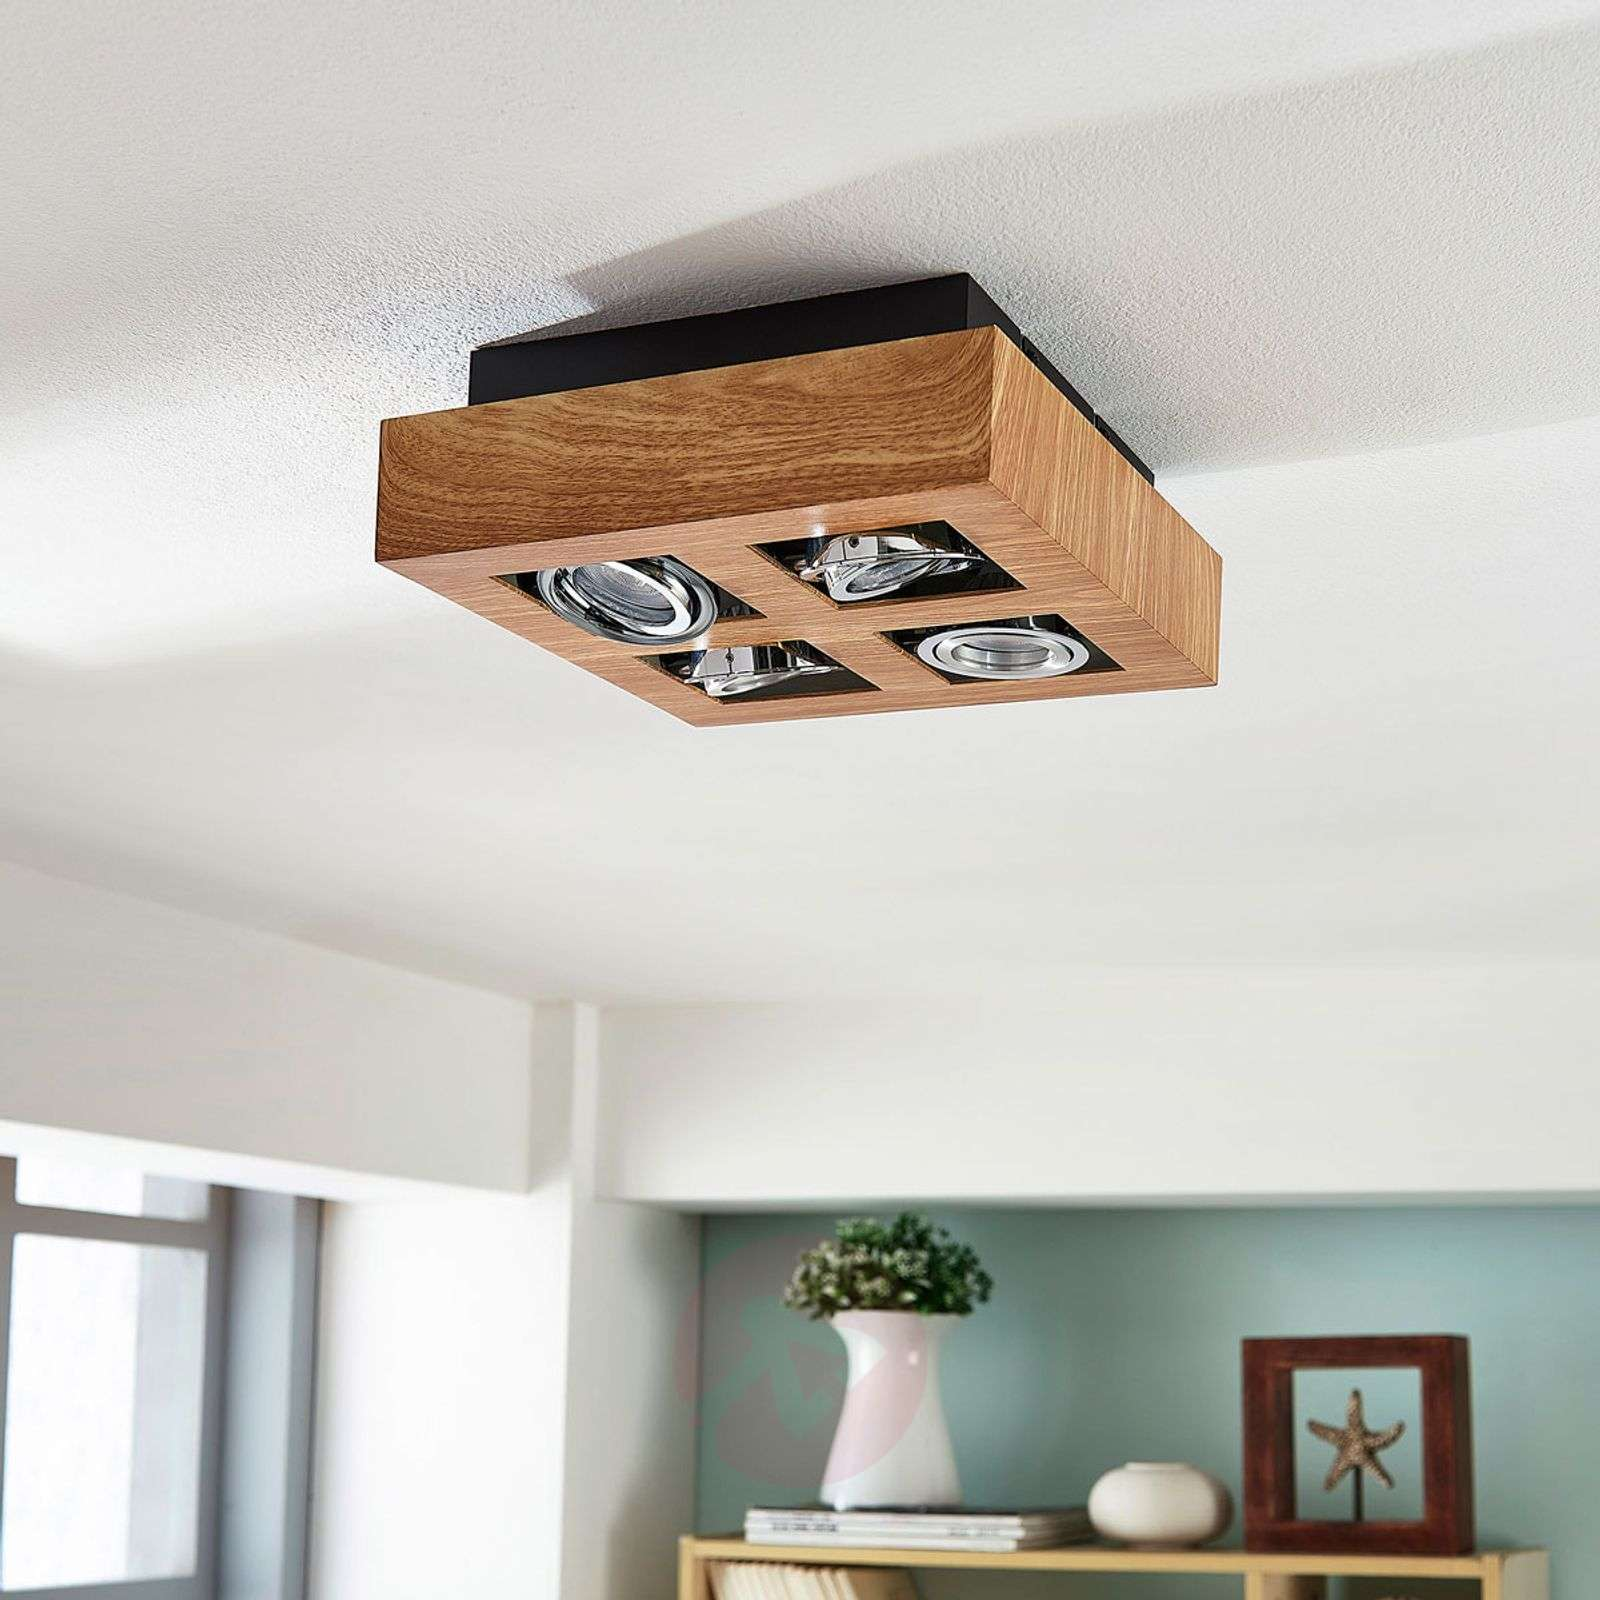 Vince Led Ceiling Light 25 X 25 Cm Wooden Optic